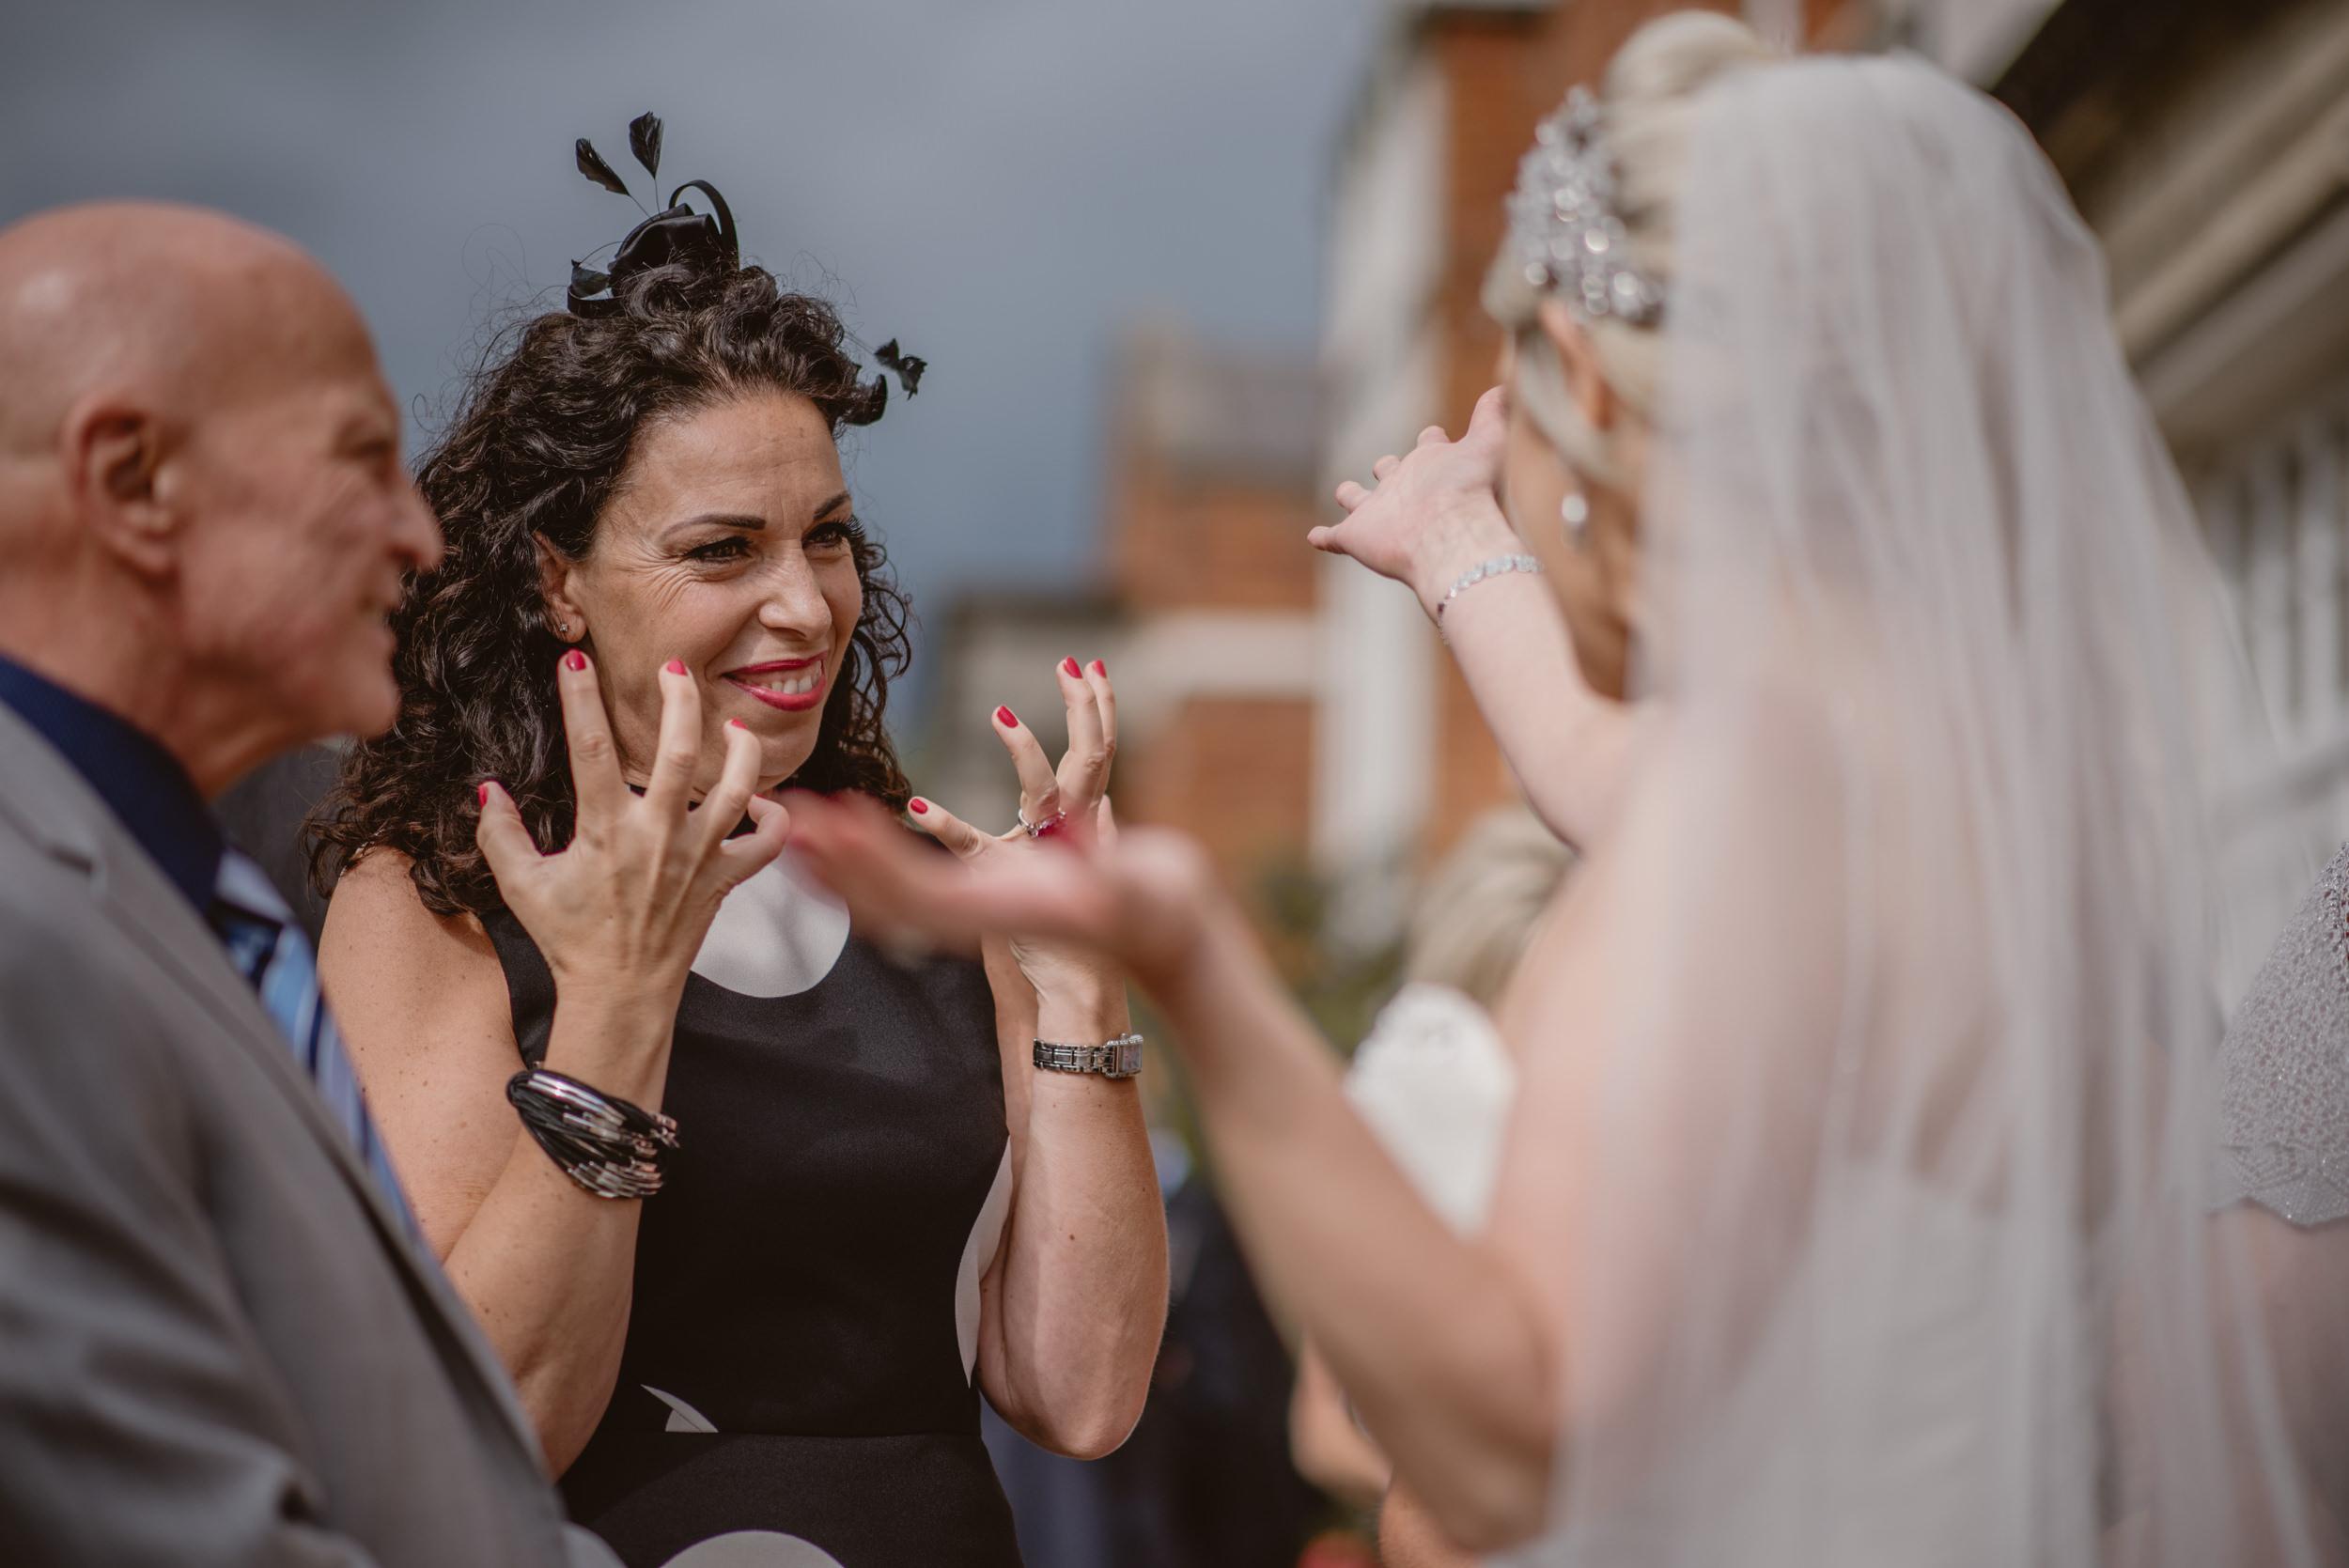 Trisha-and-Roger-wedding-The-Priory-Church-and-Chewton-Glen-Hotel-Christchurch-Manu-Mendoza-Wedding-Photography-336.jpg